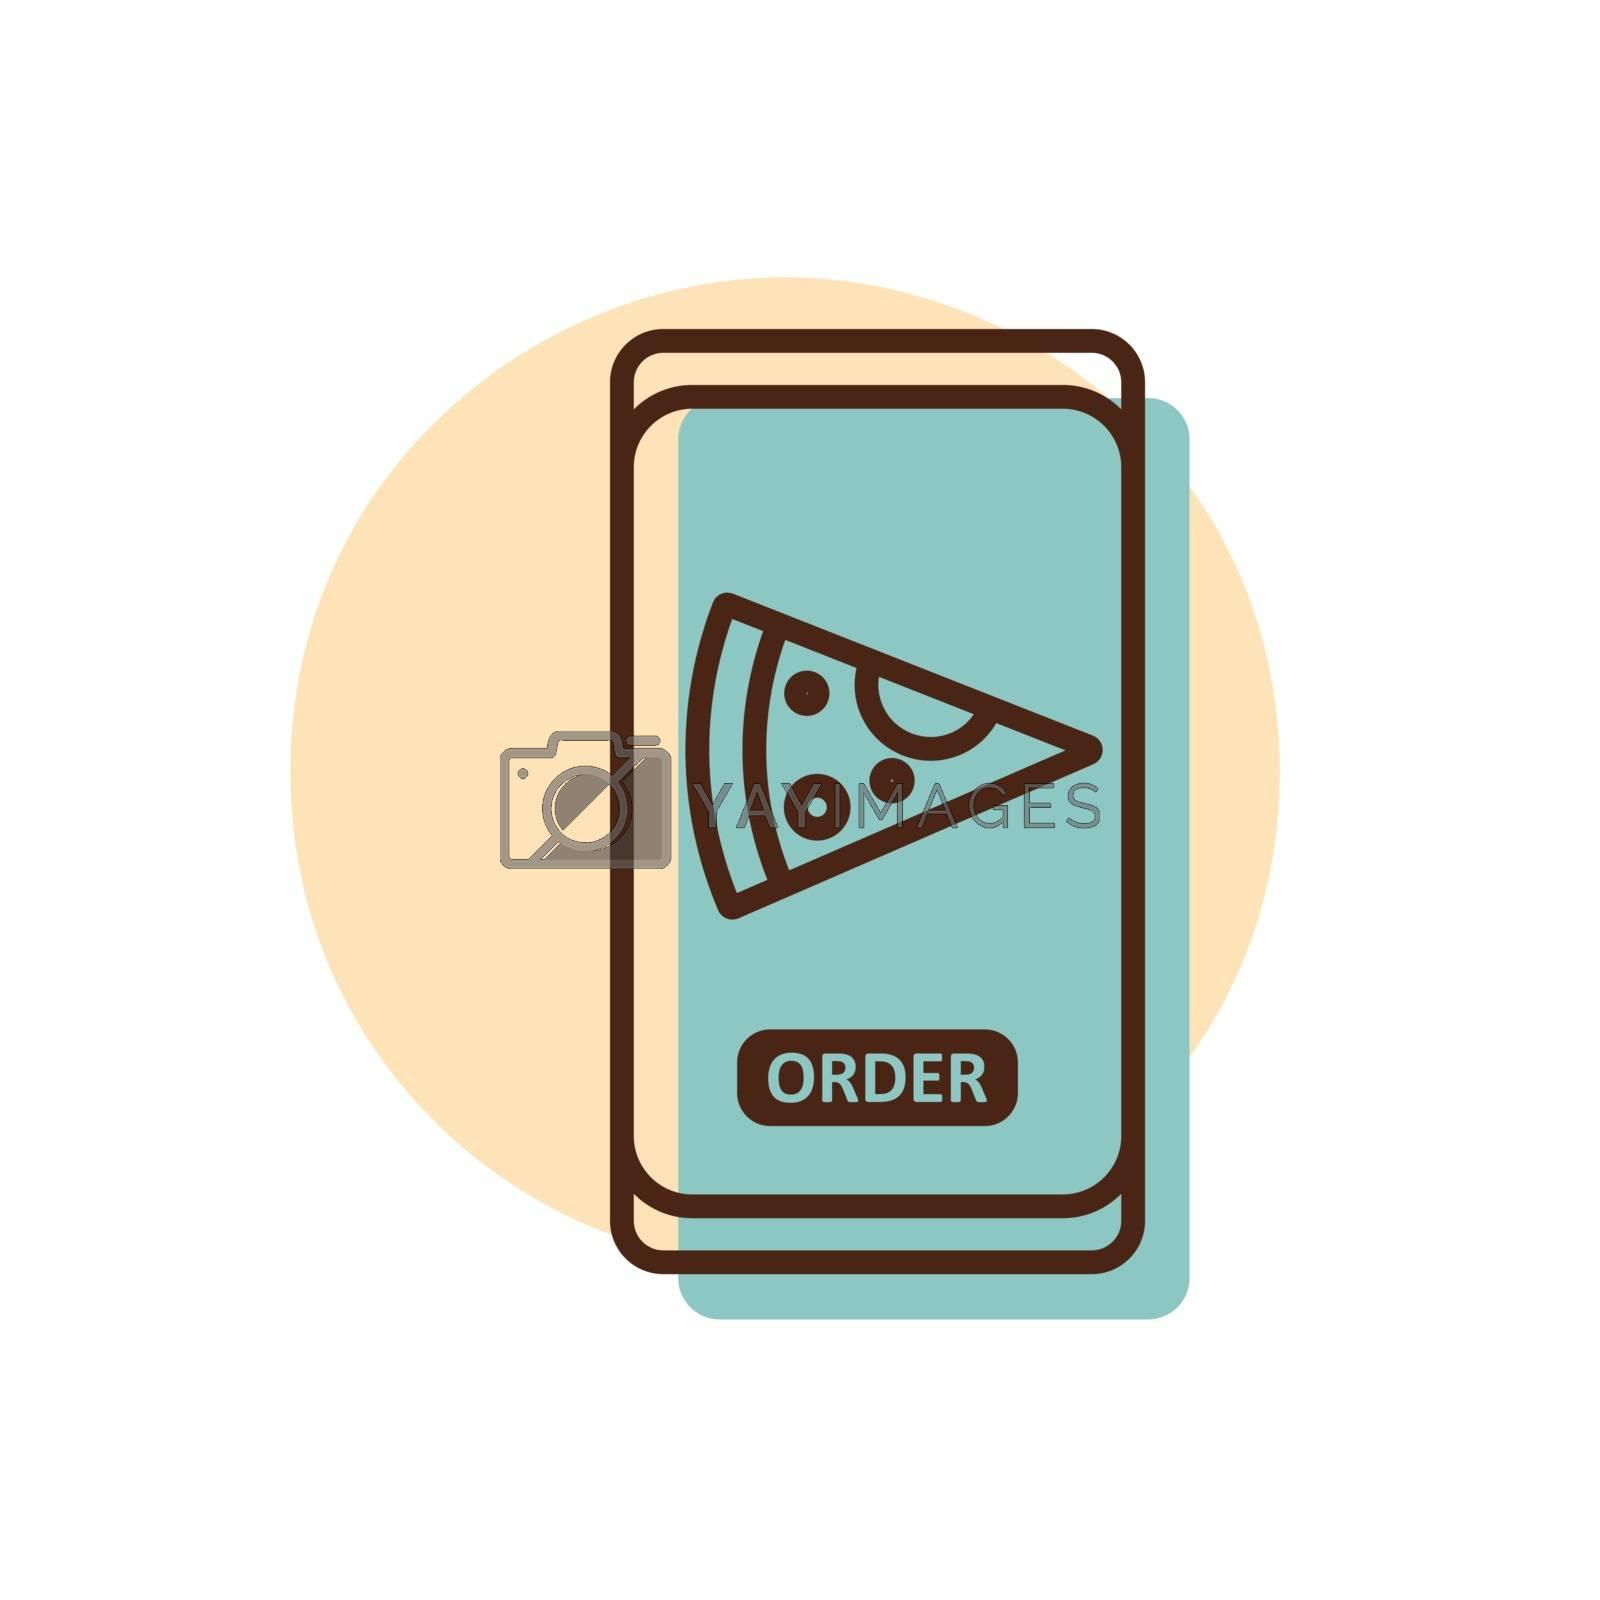 Fast food delivery service vector icon. Pizza slice sign. Mobile app order food online website.